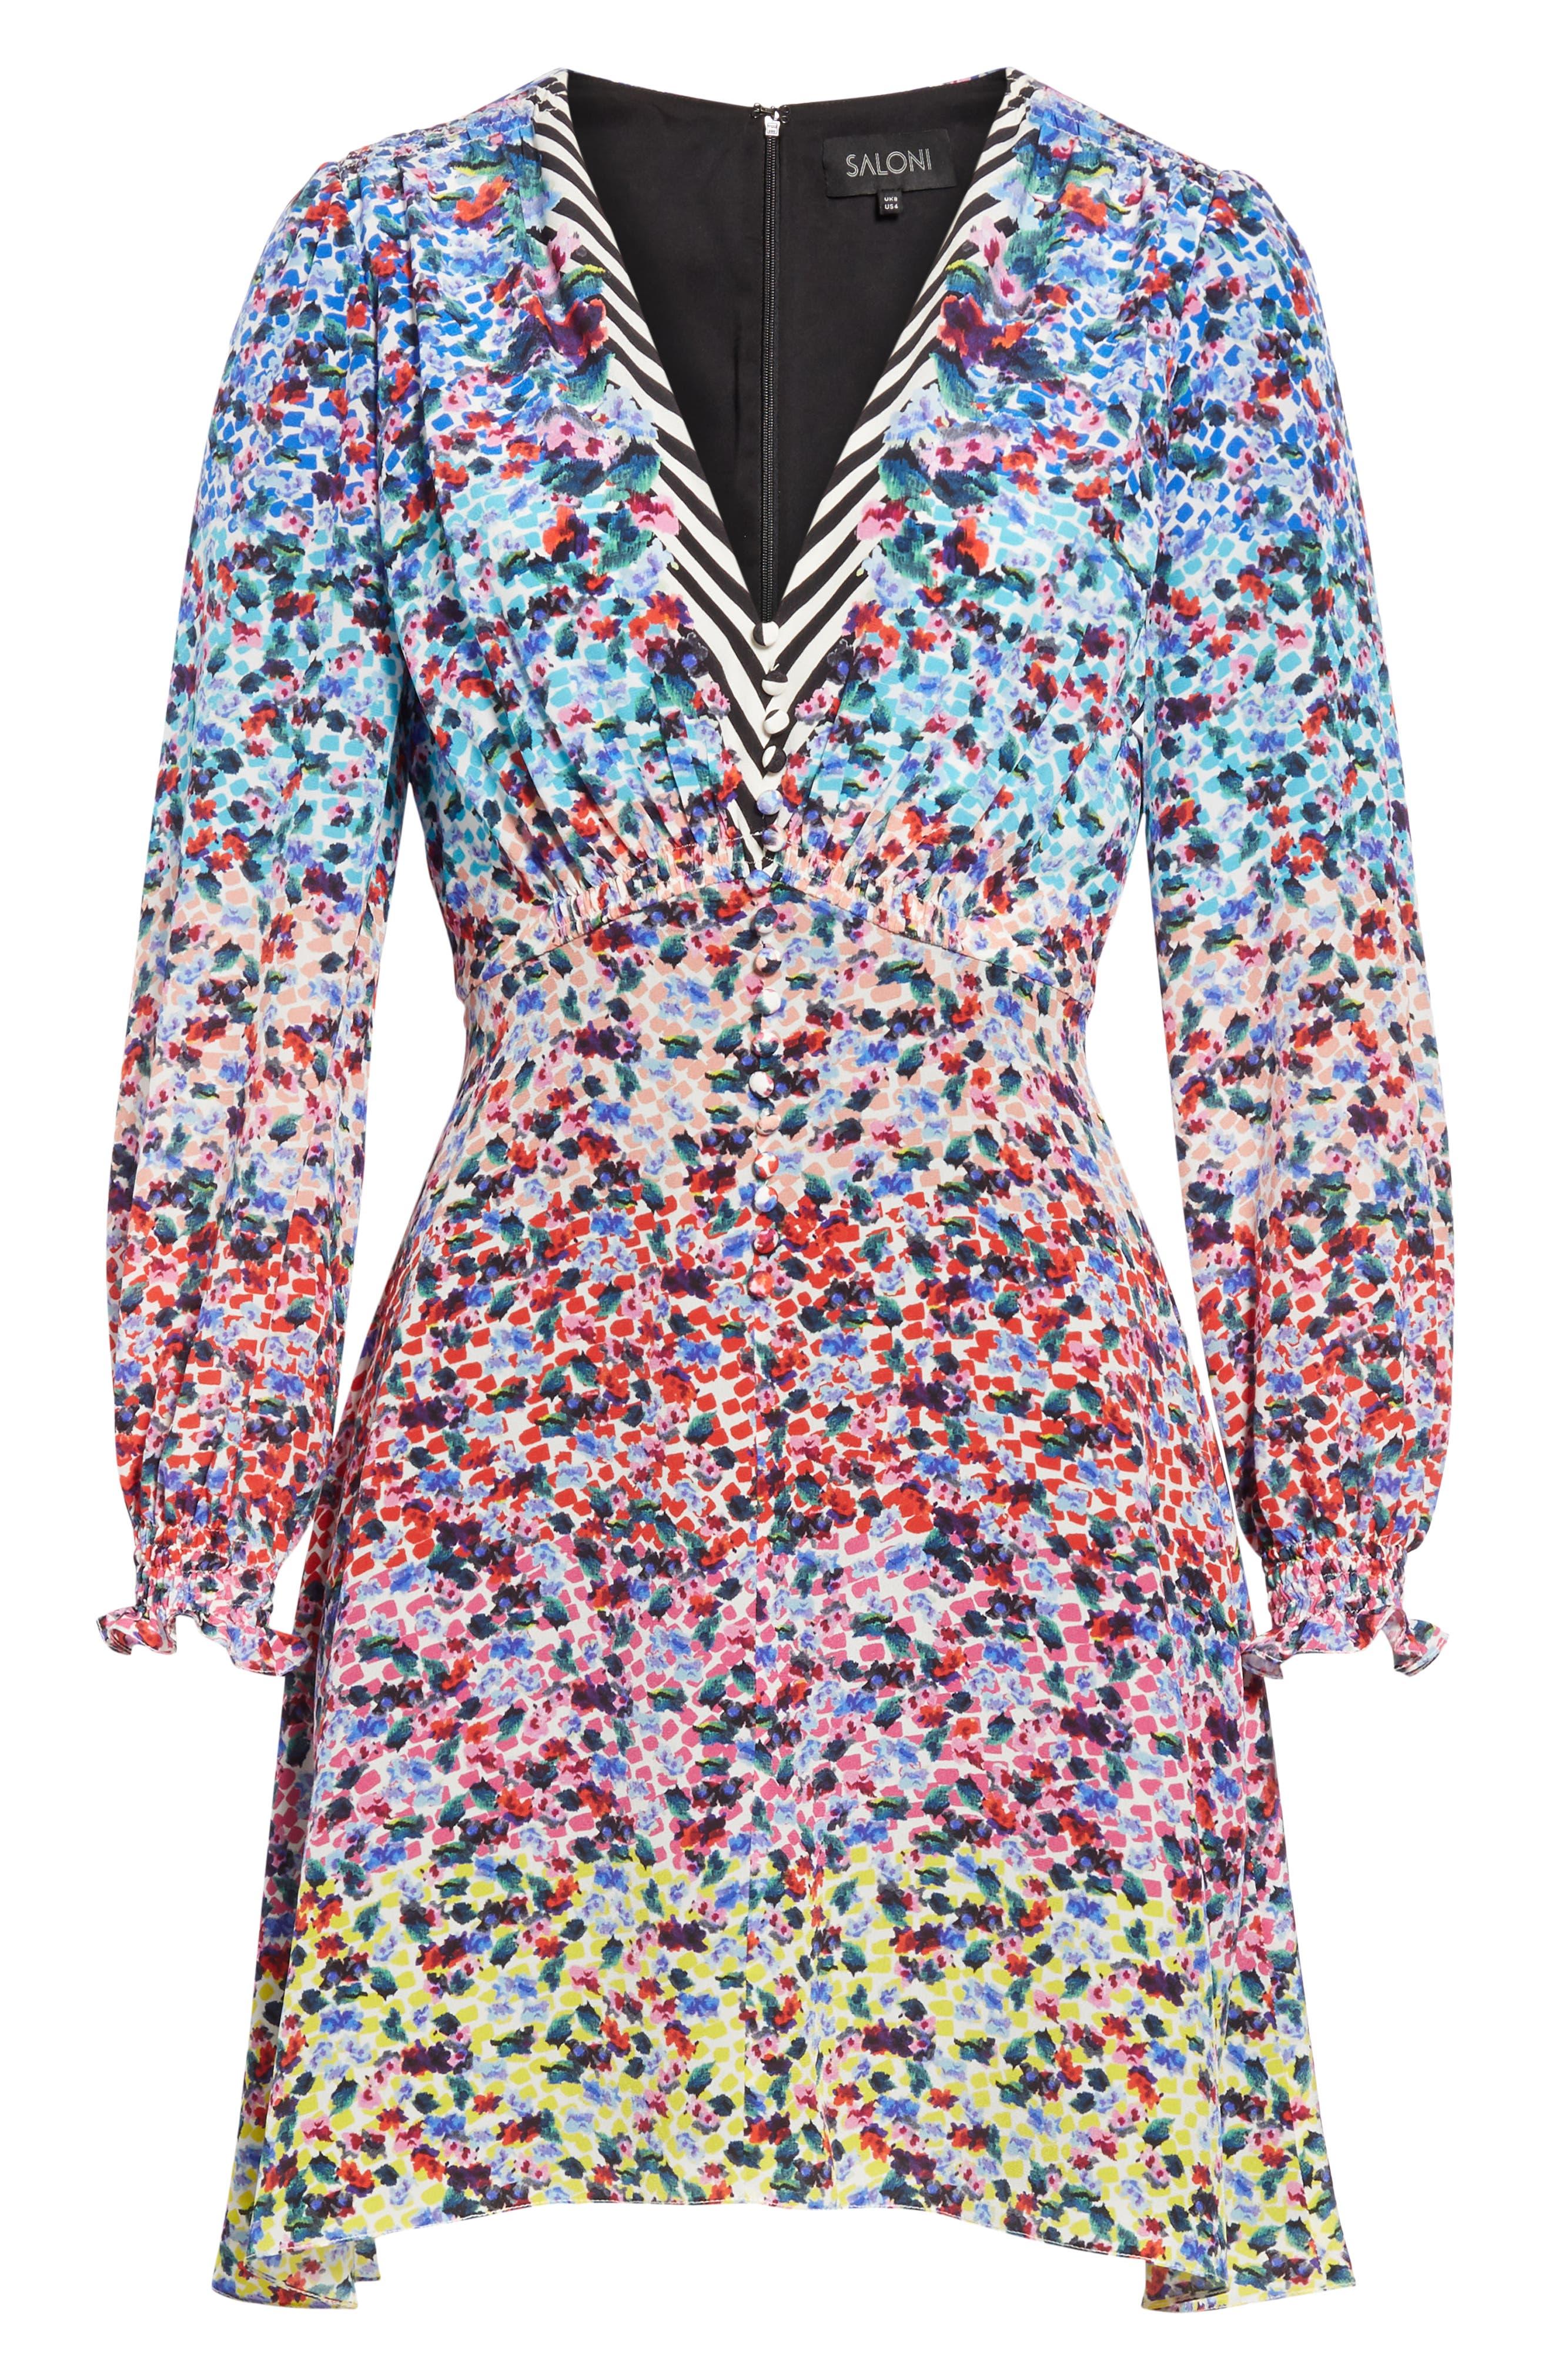 SALONI, Eve Floral Print Dress, Alternate thumbnail 7, color, RAINBOW GARDENIA PLMT